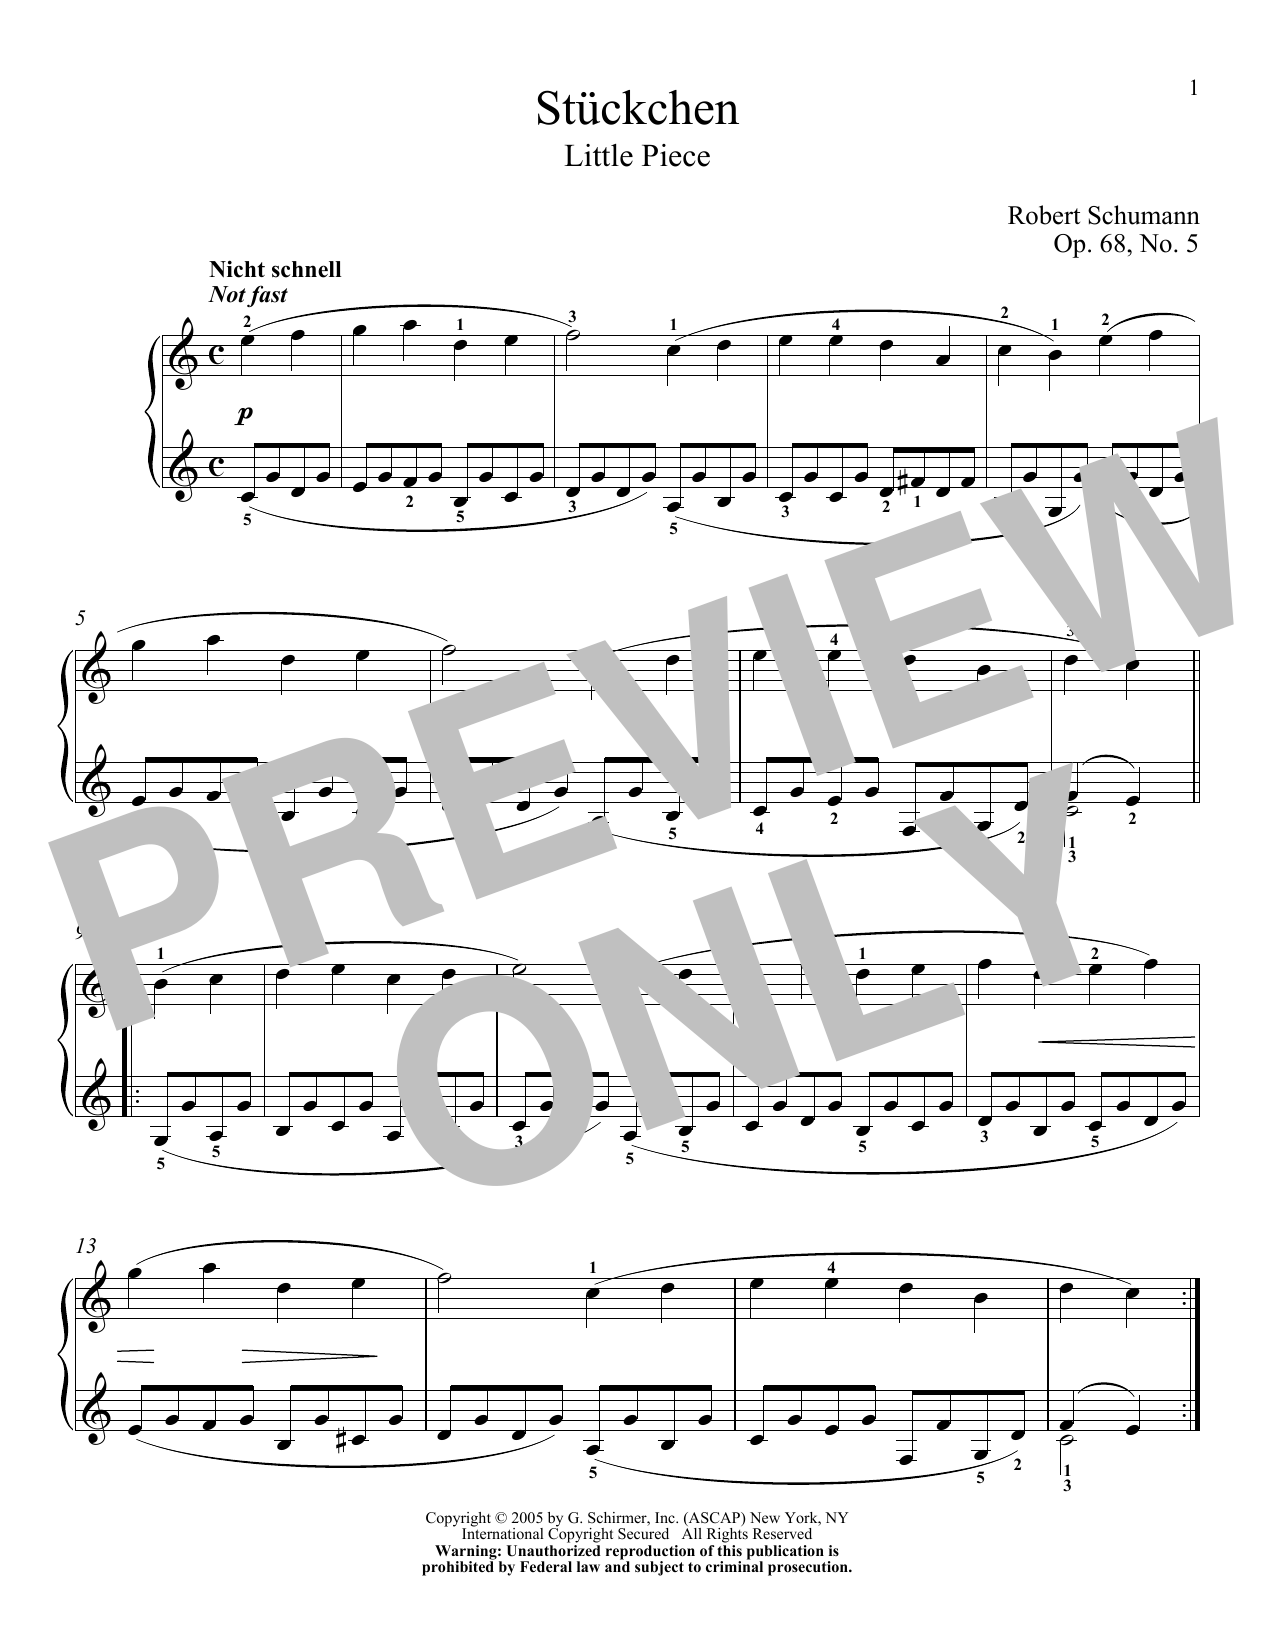 Download Robert Schumann 'Little Piece, Op. 68, No. 5' Digital Sheet Music Notes & Chords and start playing in minutes